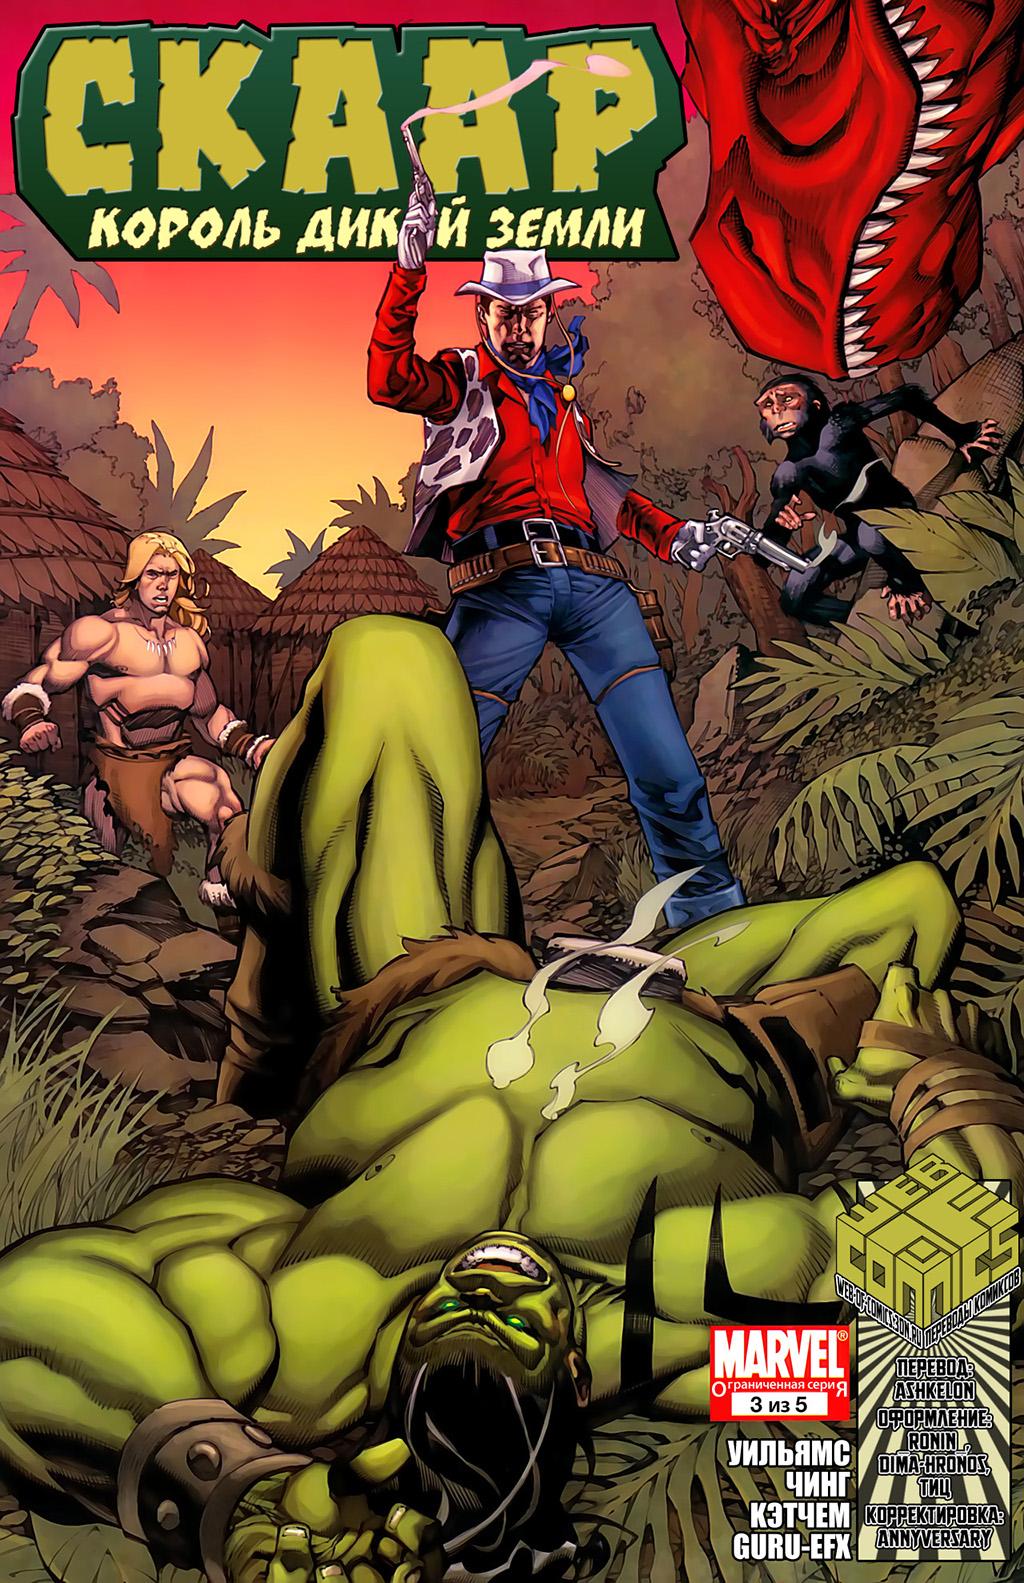 Комикс Скаар: Король Дикой Земли